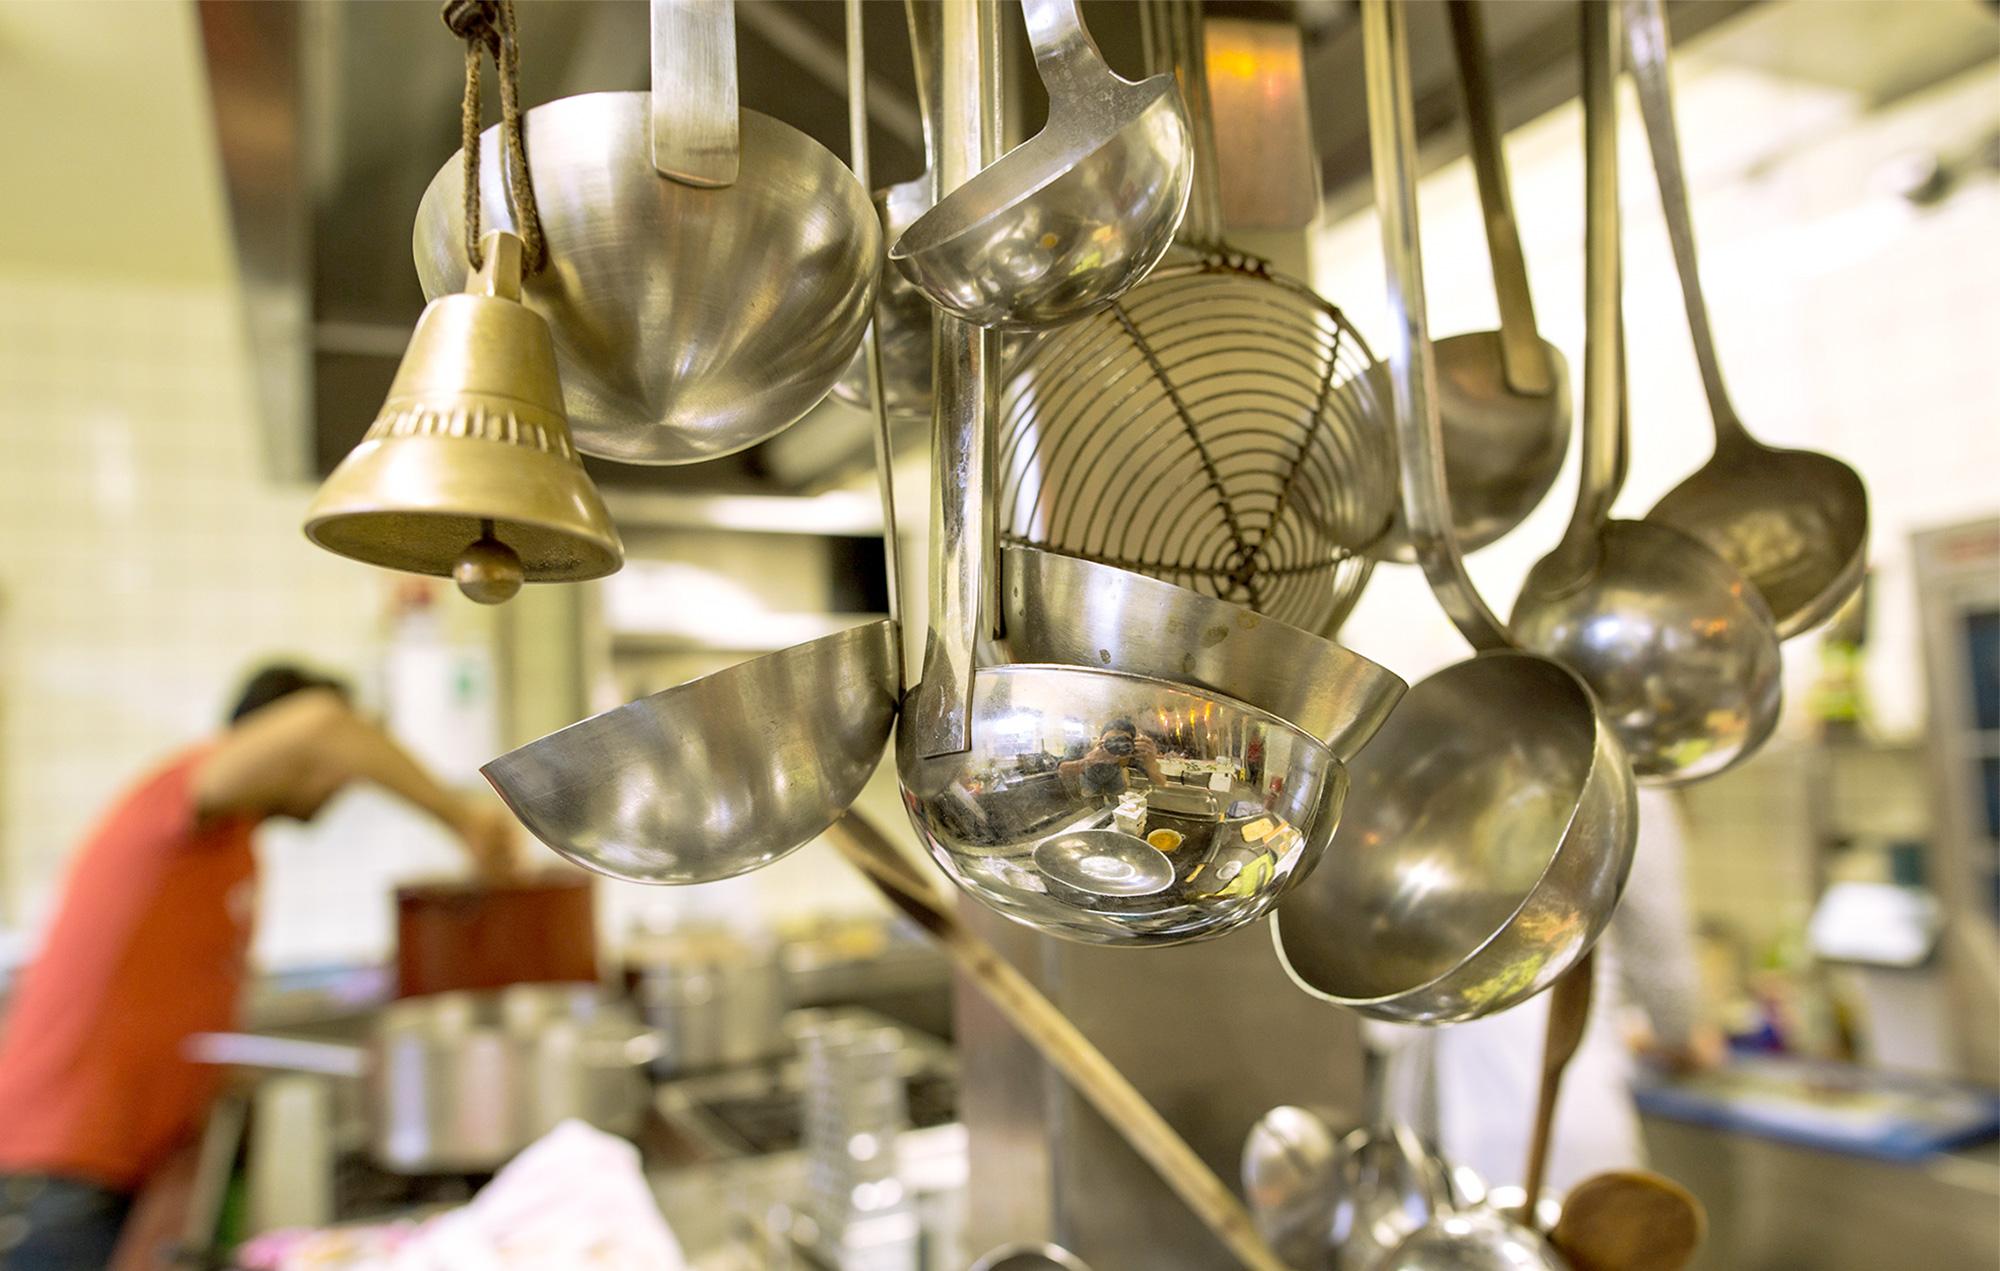 Die Küche des Grandhotel Cosmopolis / Fotocredits: C. Frabauke